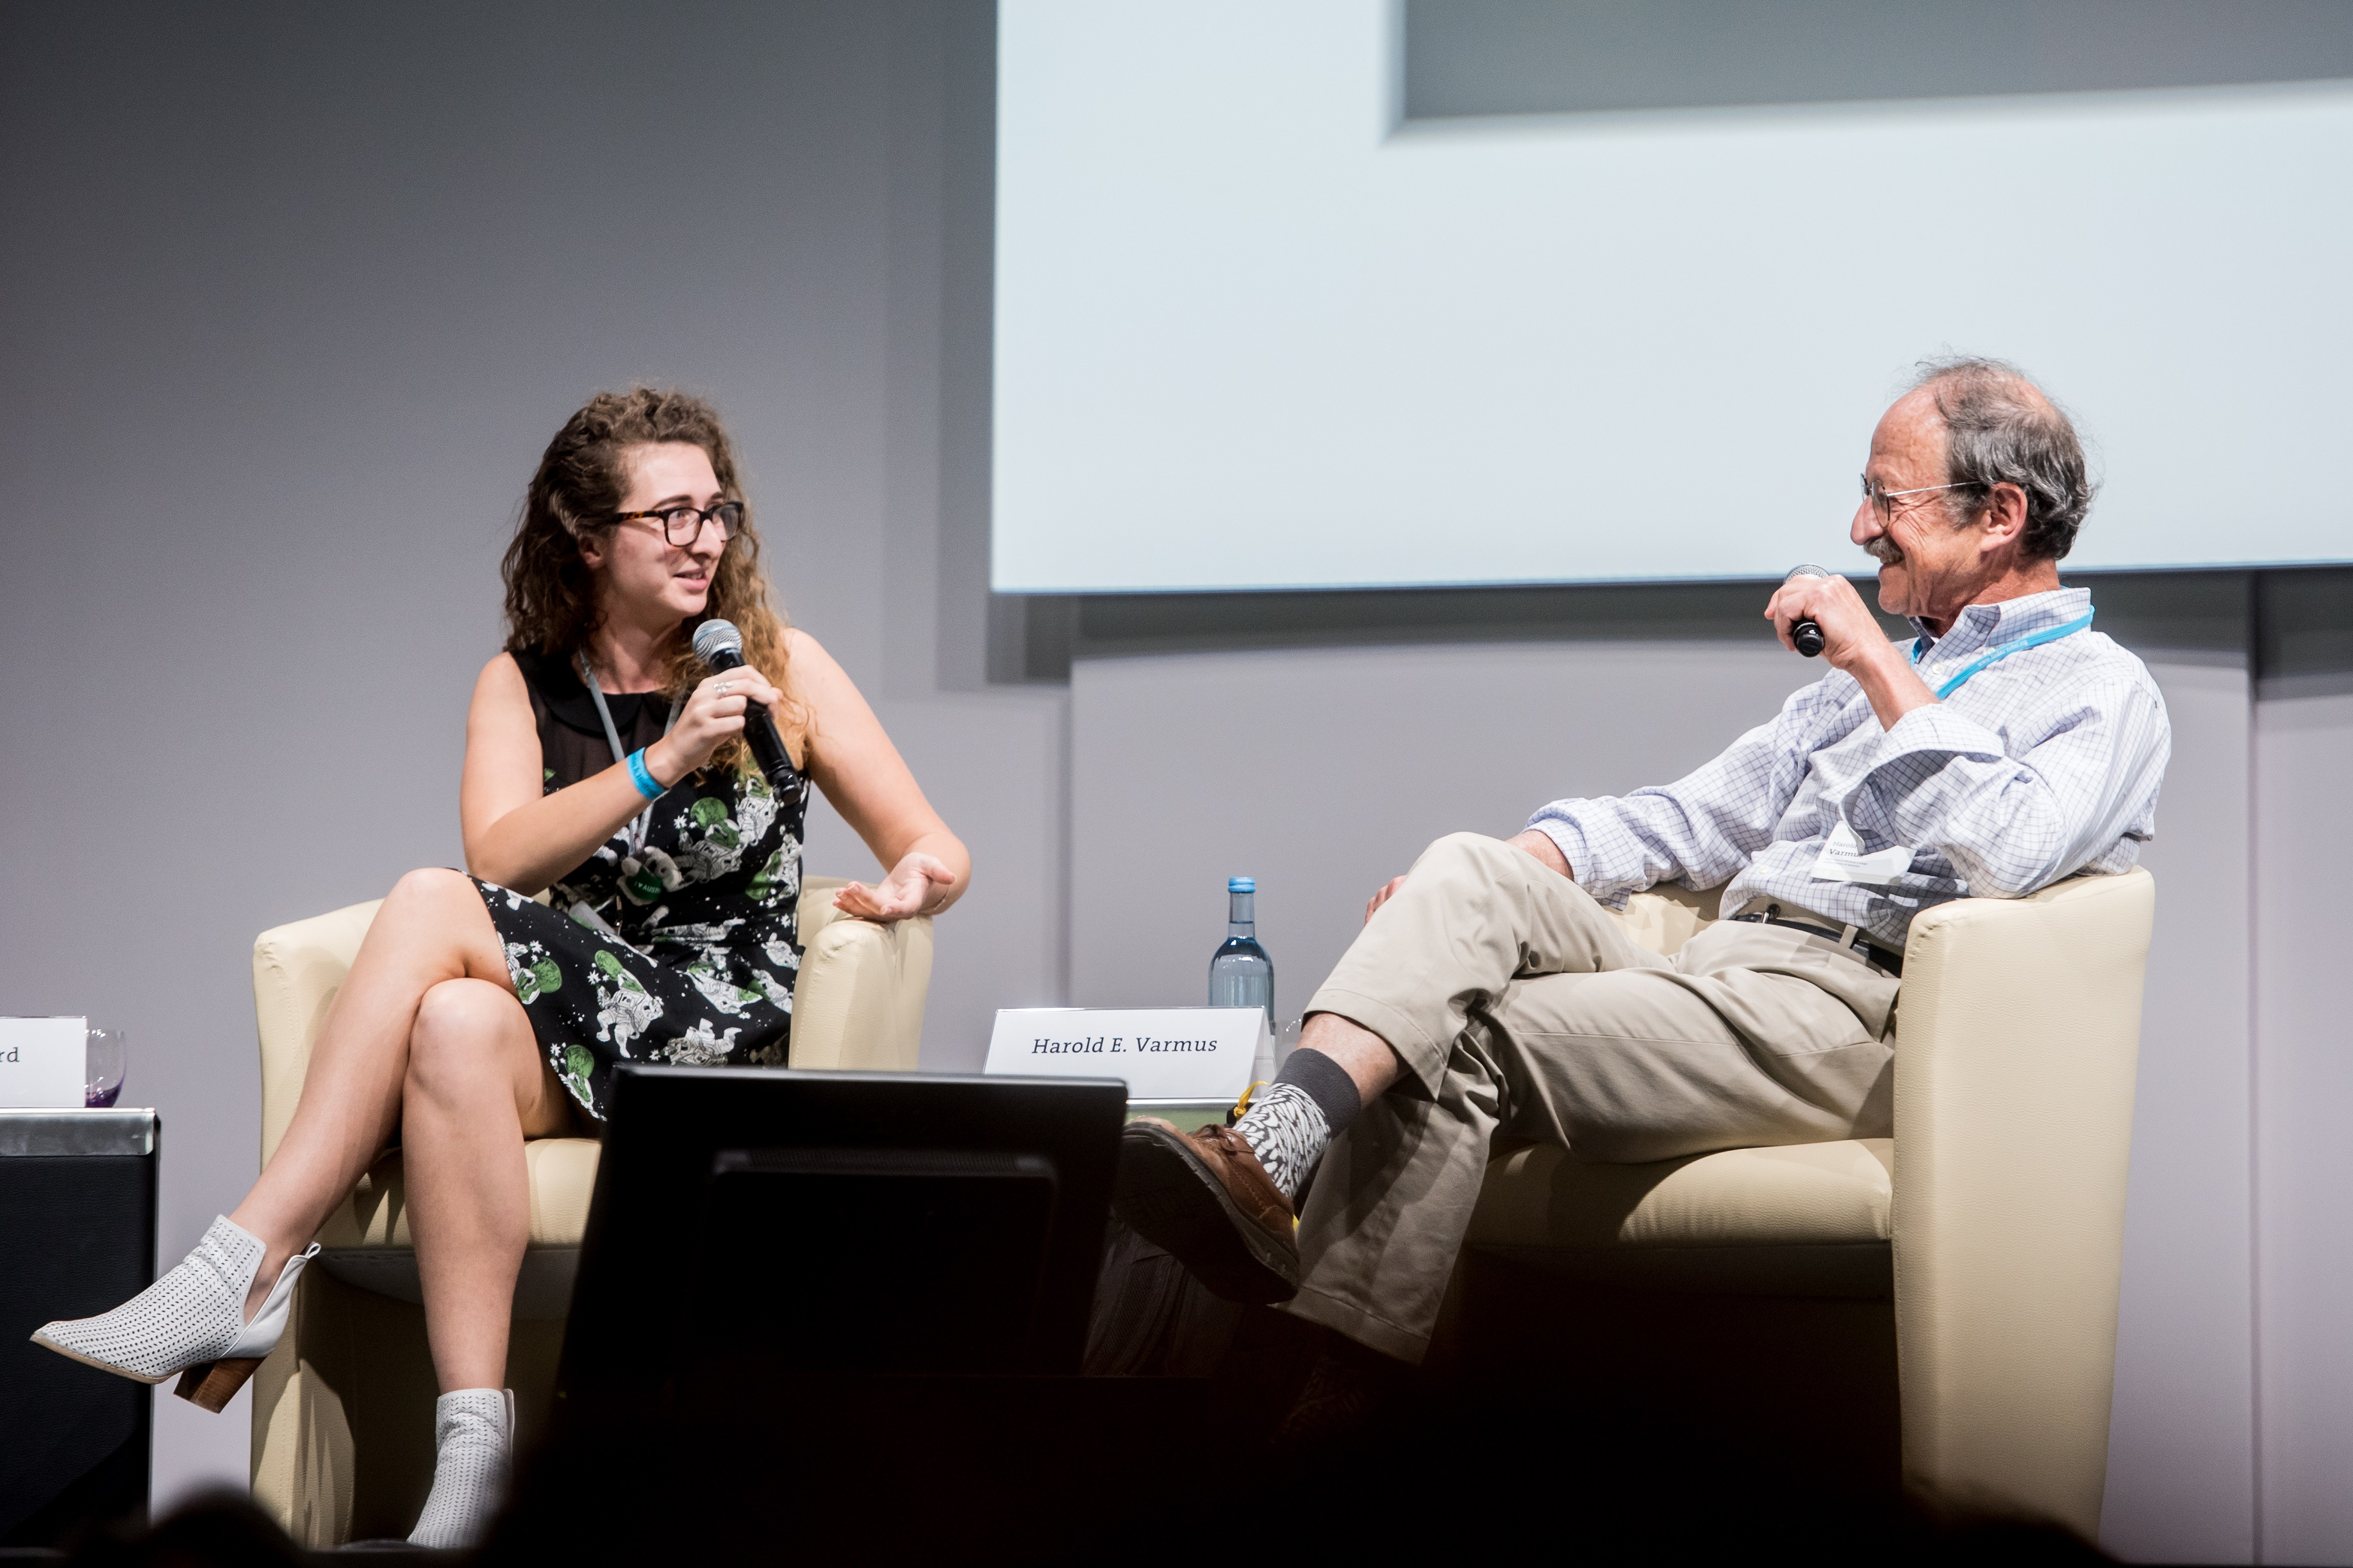 Amy Shepherd And Harold Varmus During The #LINO18 Panel Discussion U0027Publish  Or Perishu0027. Photo/Credit: Patrick Kunkel/Lindau Nobel Laureate Meetings